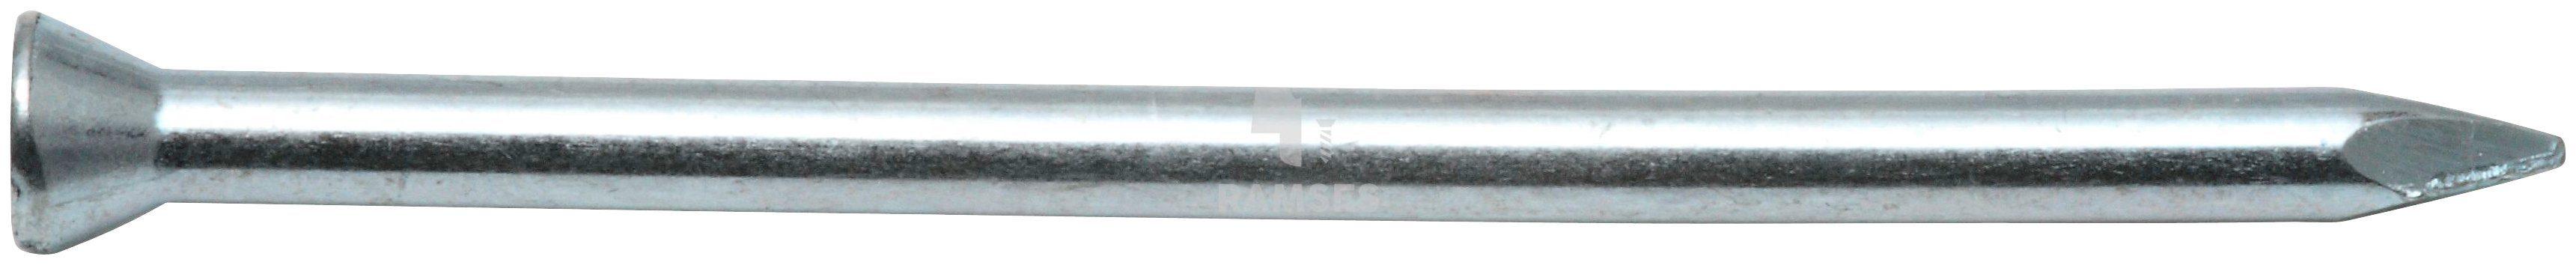 RAMSES Nagel , 3,5 x 65 mm Stahl verzinkt, 250 Stk.